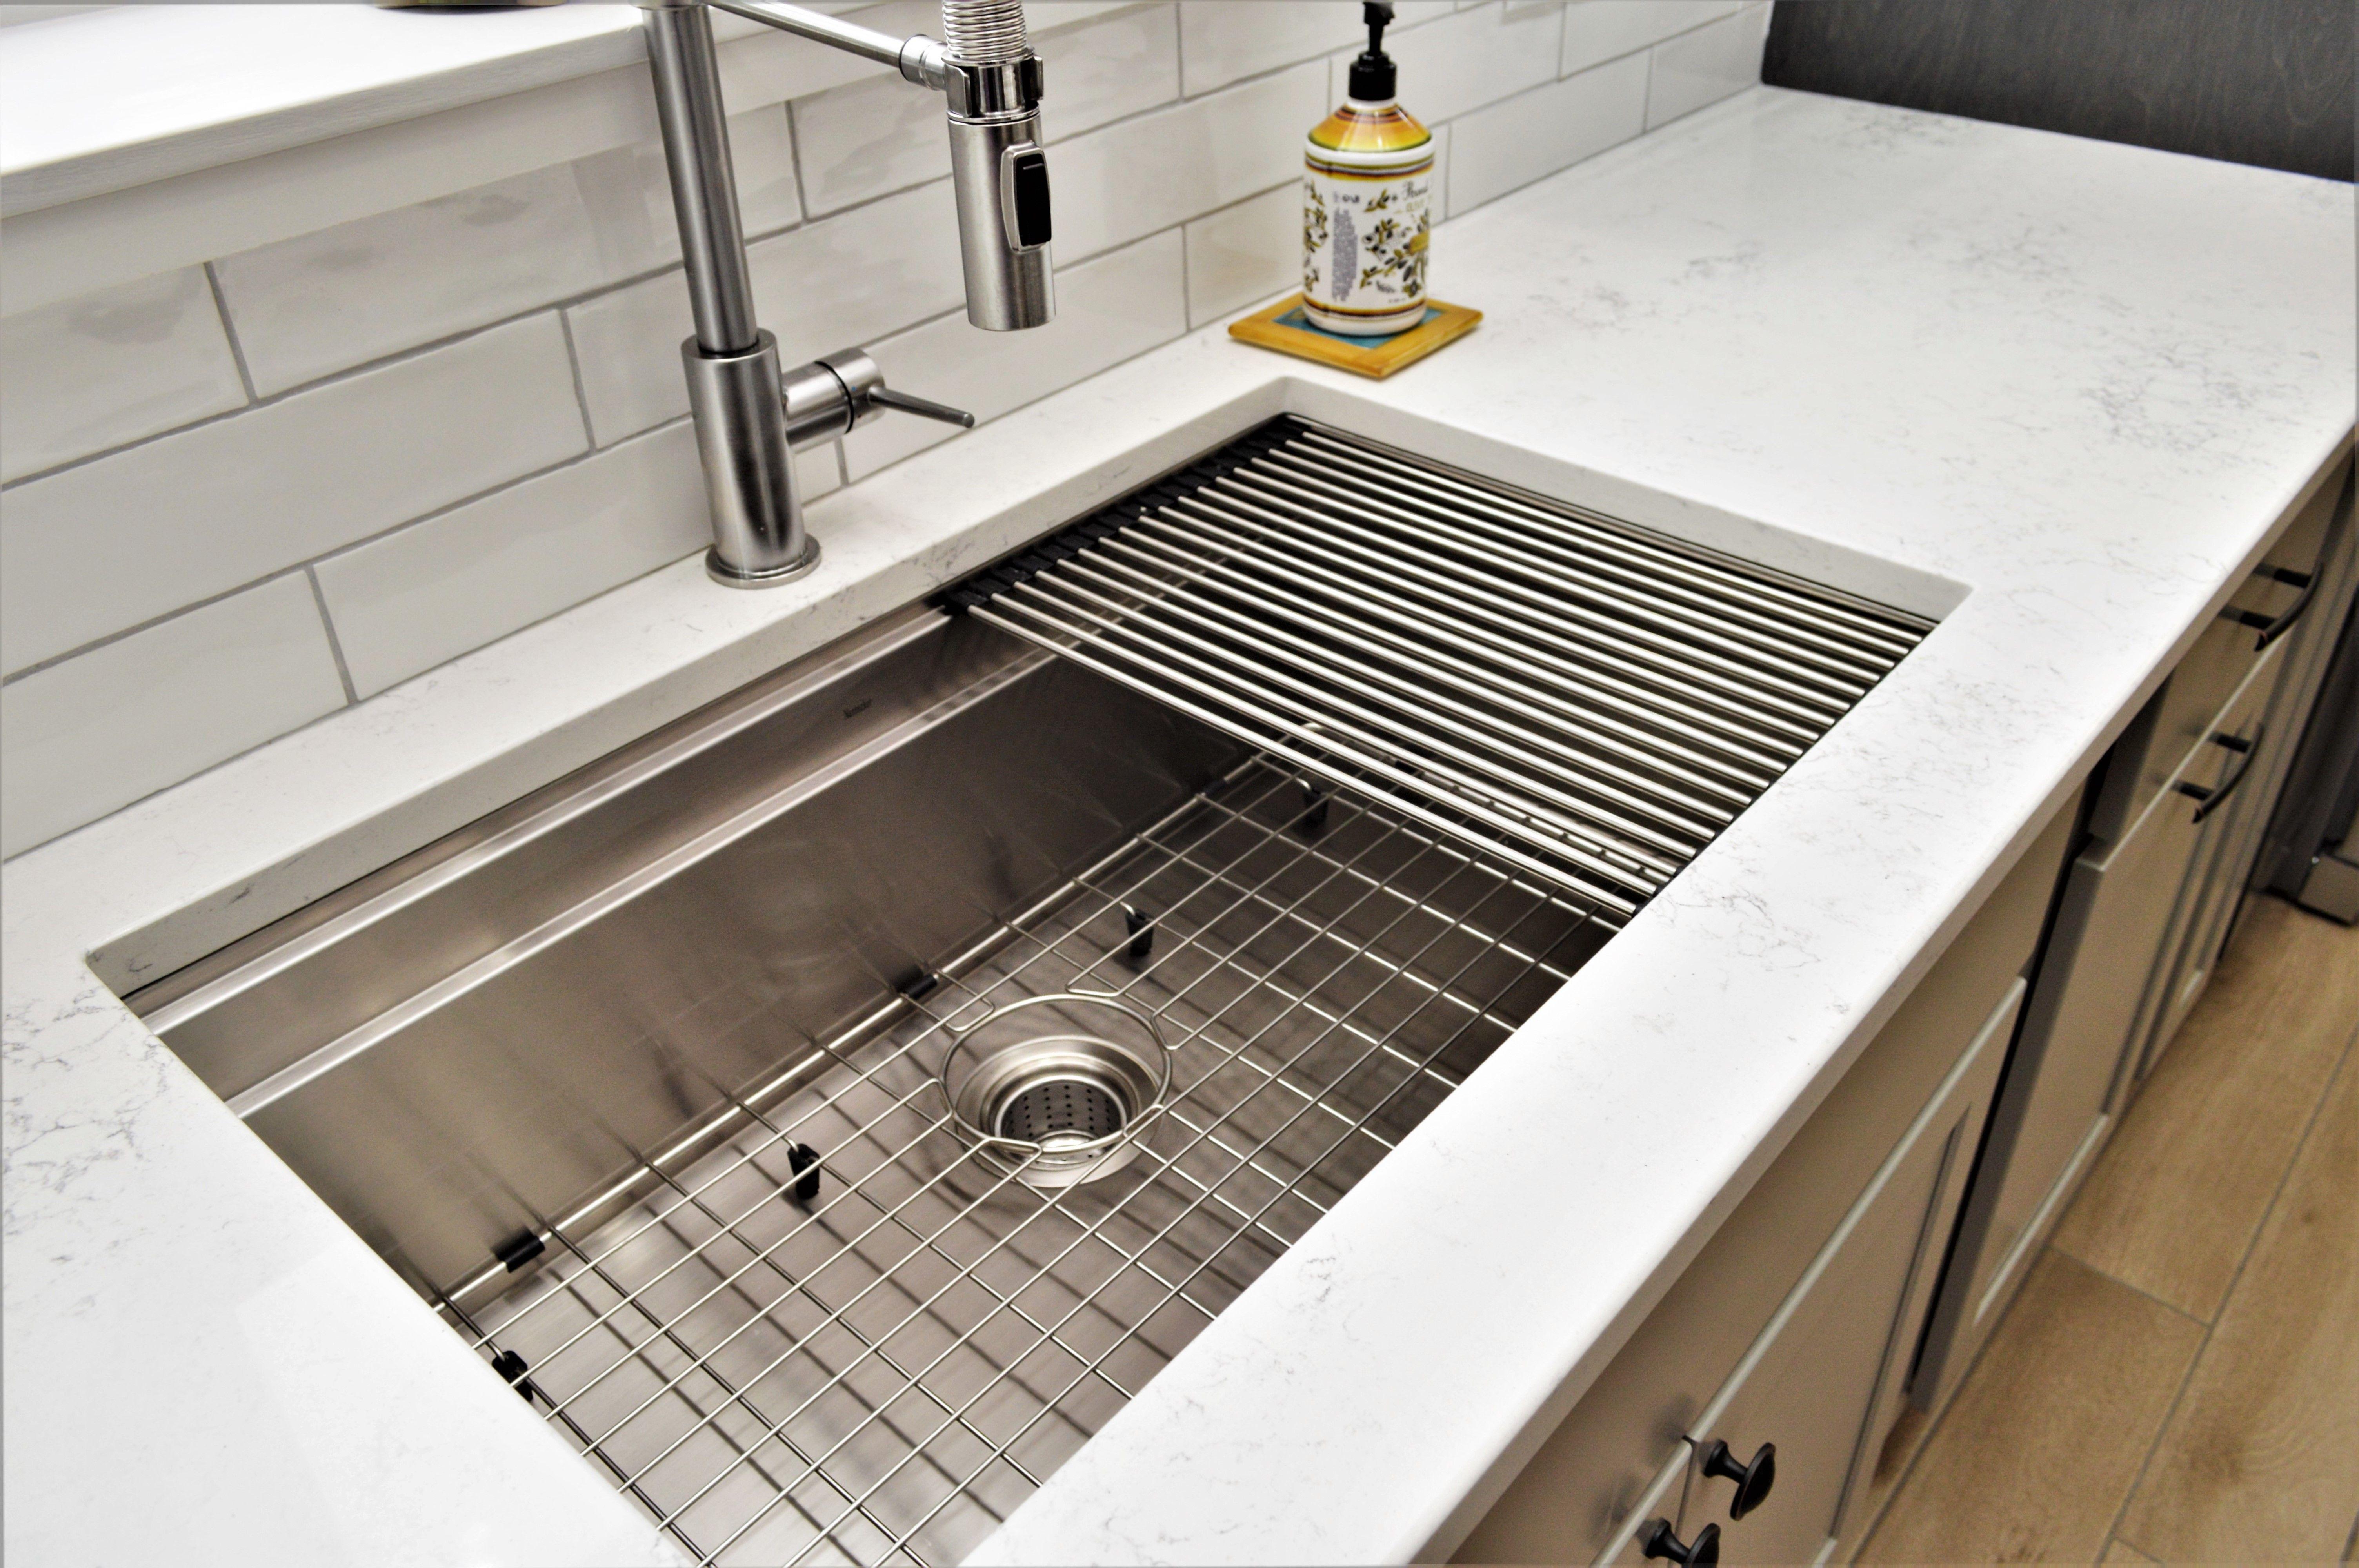 bailey s cabinets nantucket single bowl undermount stainless steel sink model zrps322016 undermount stainless steel sink sink stainless steel sinks